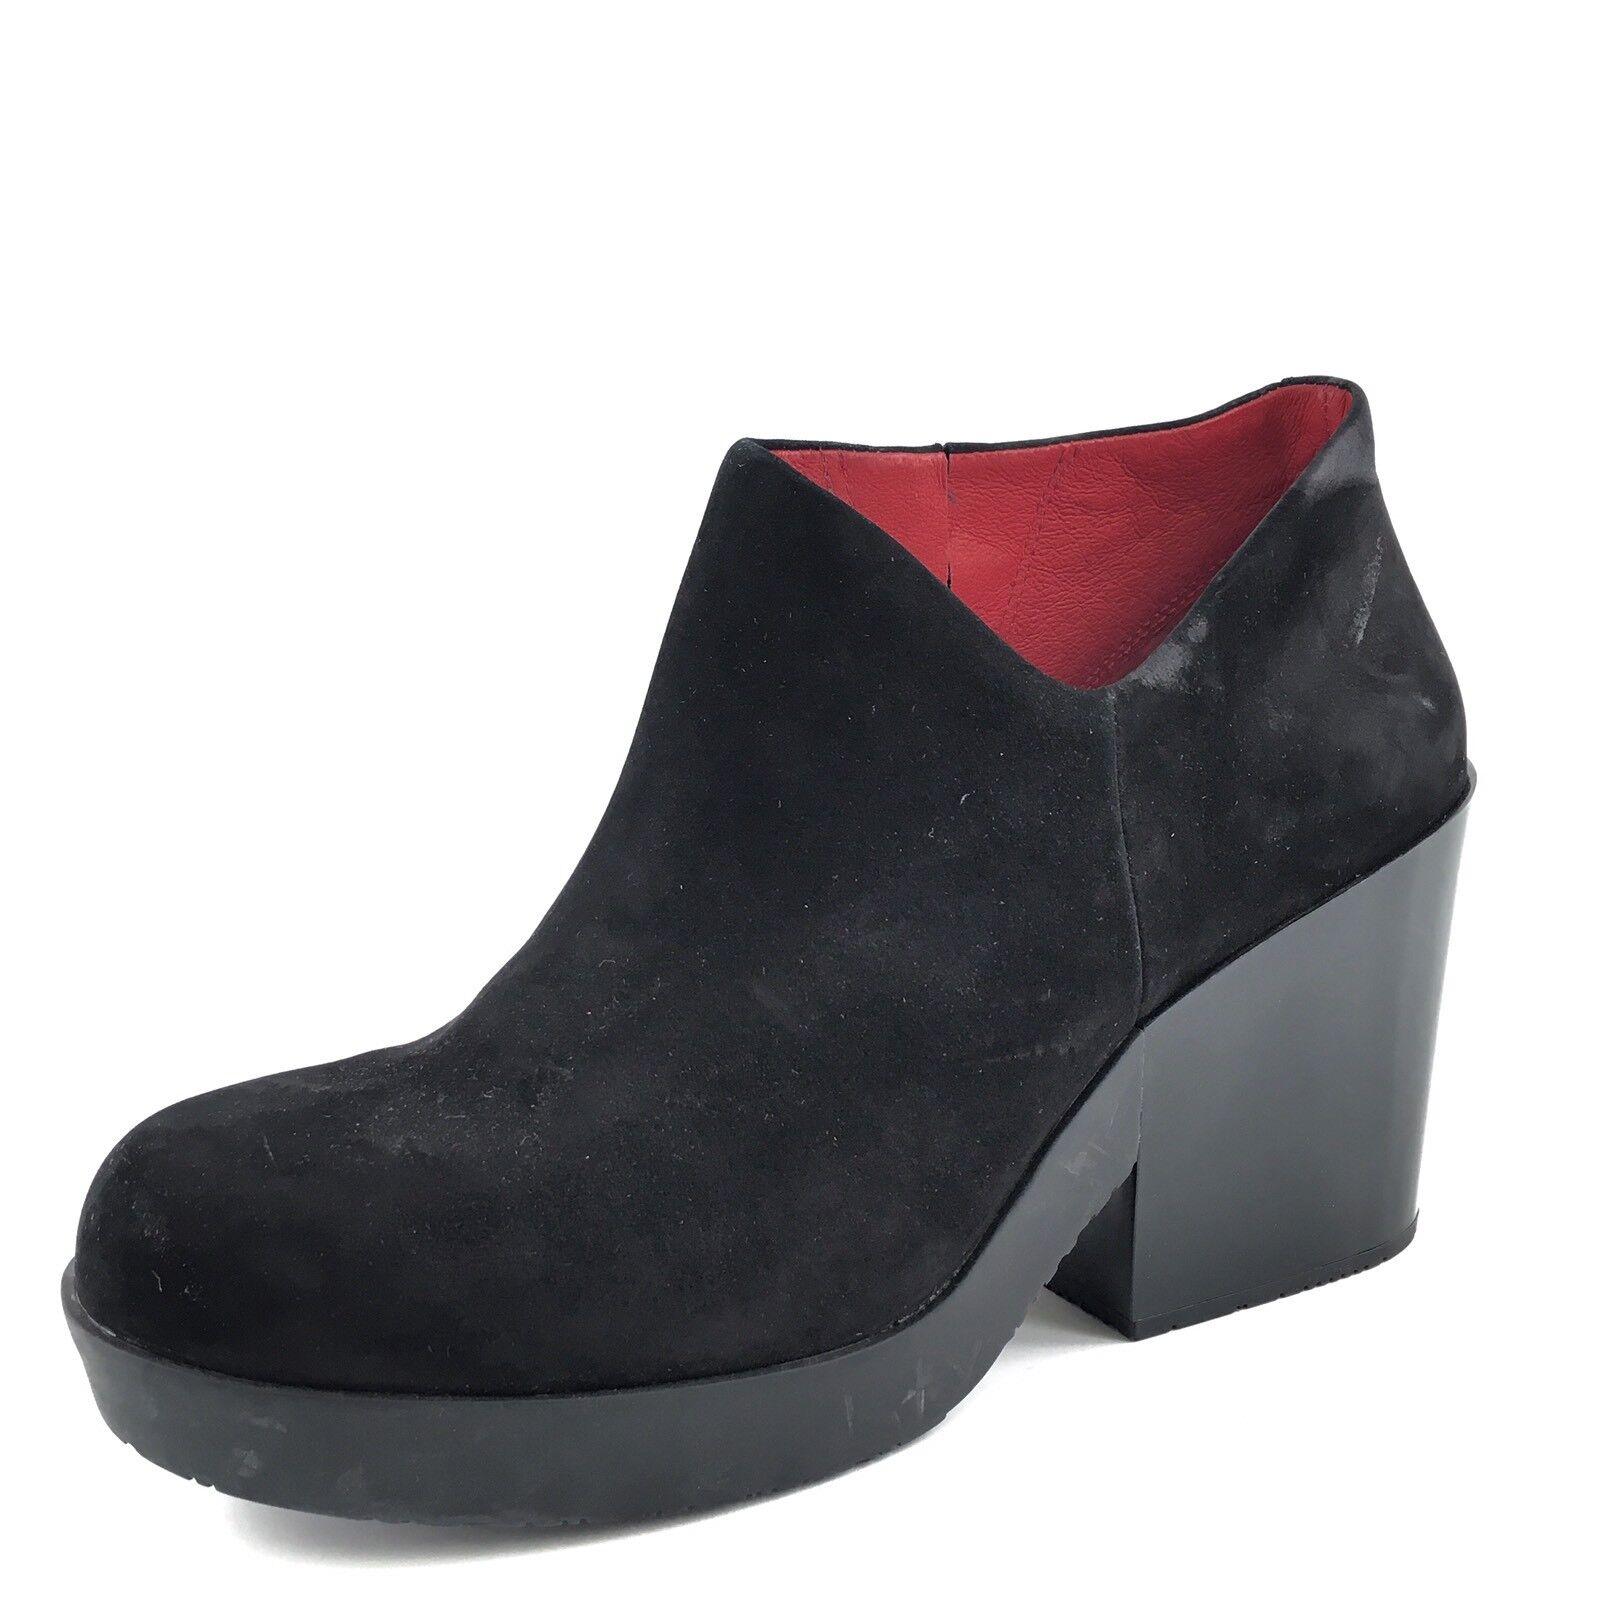 Camper Womens Black Suede Platform Ankle Boots Women's Size 10 M RP  240